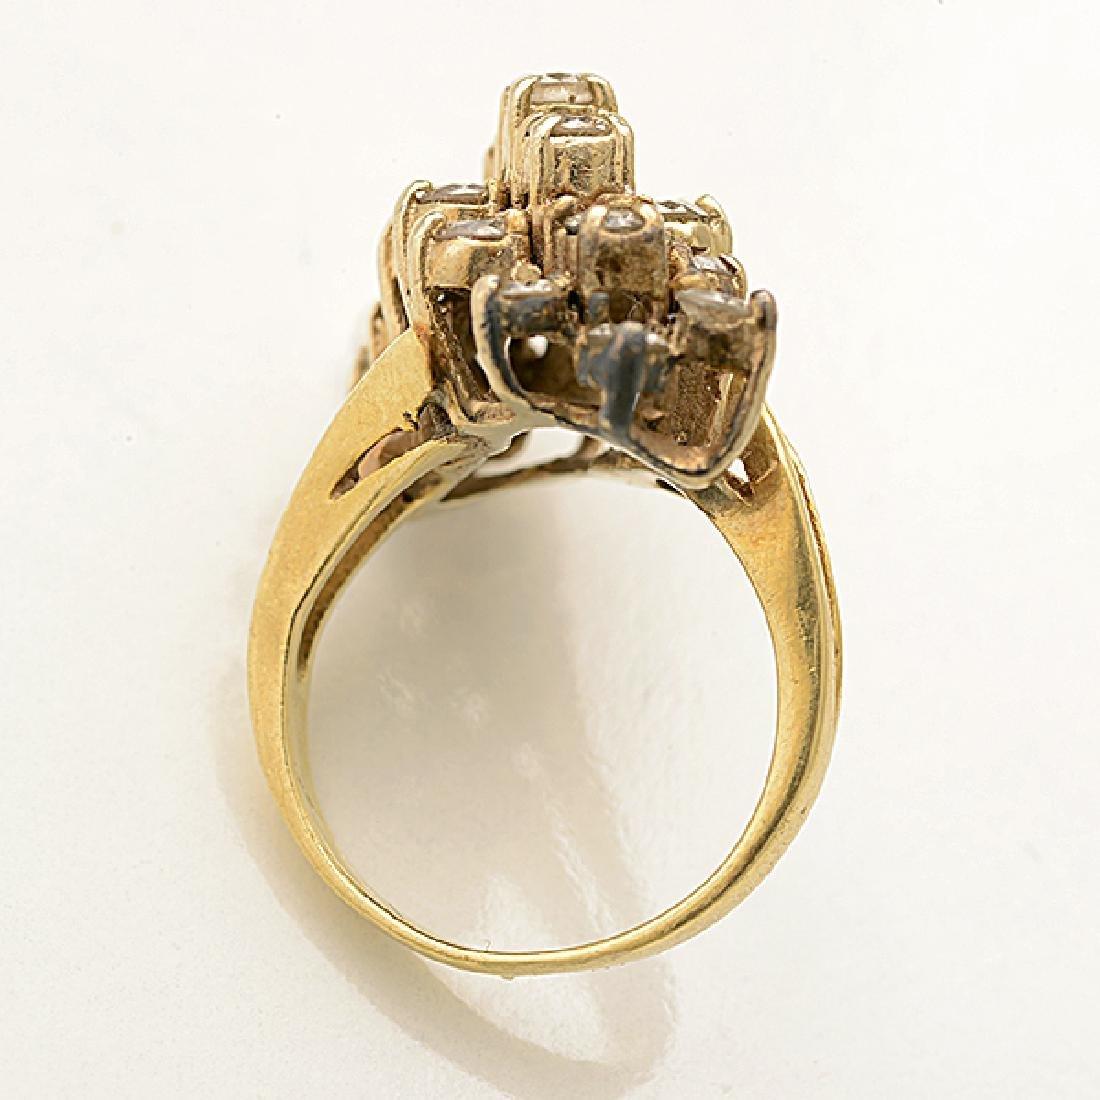 Diamond, 14k Yellow Gold Ring. - 3